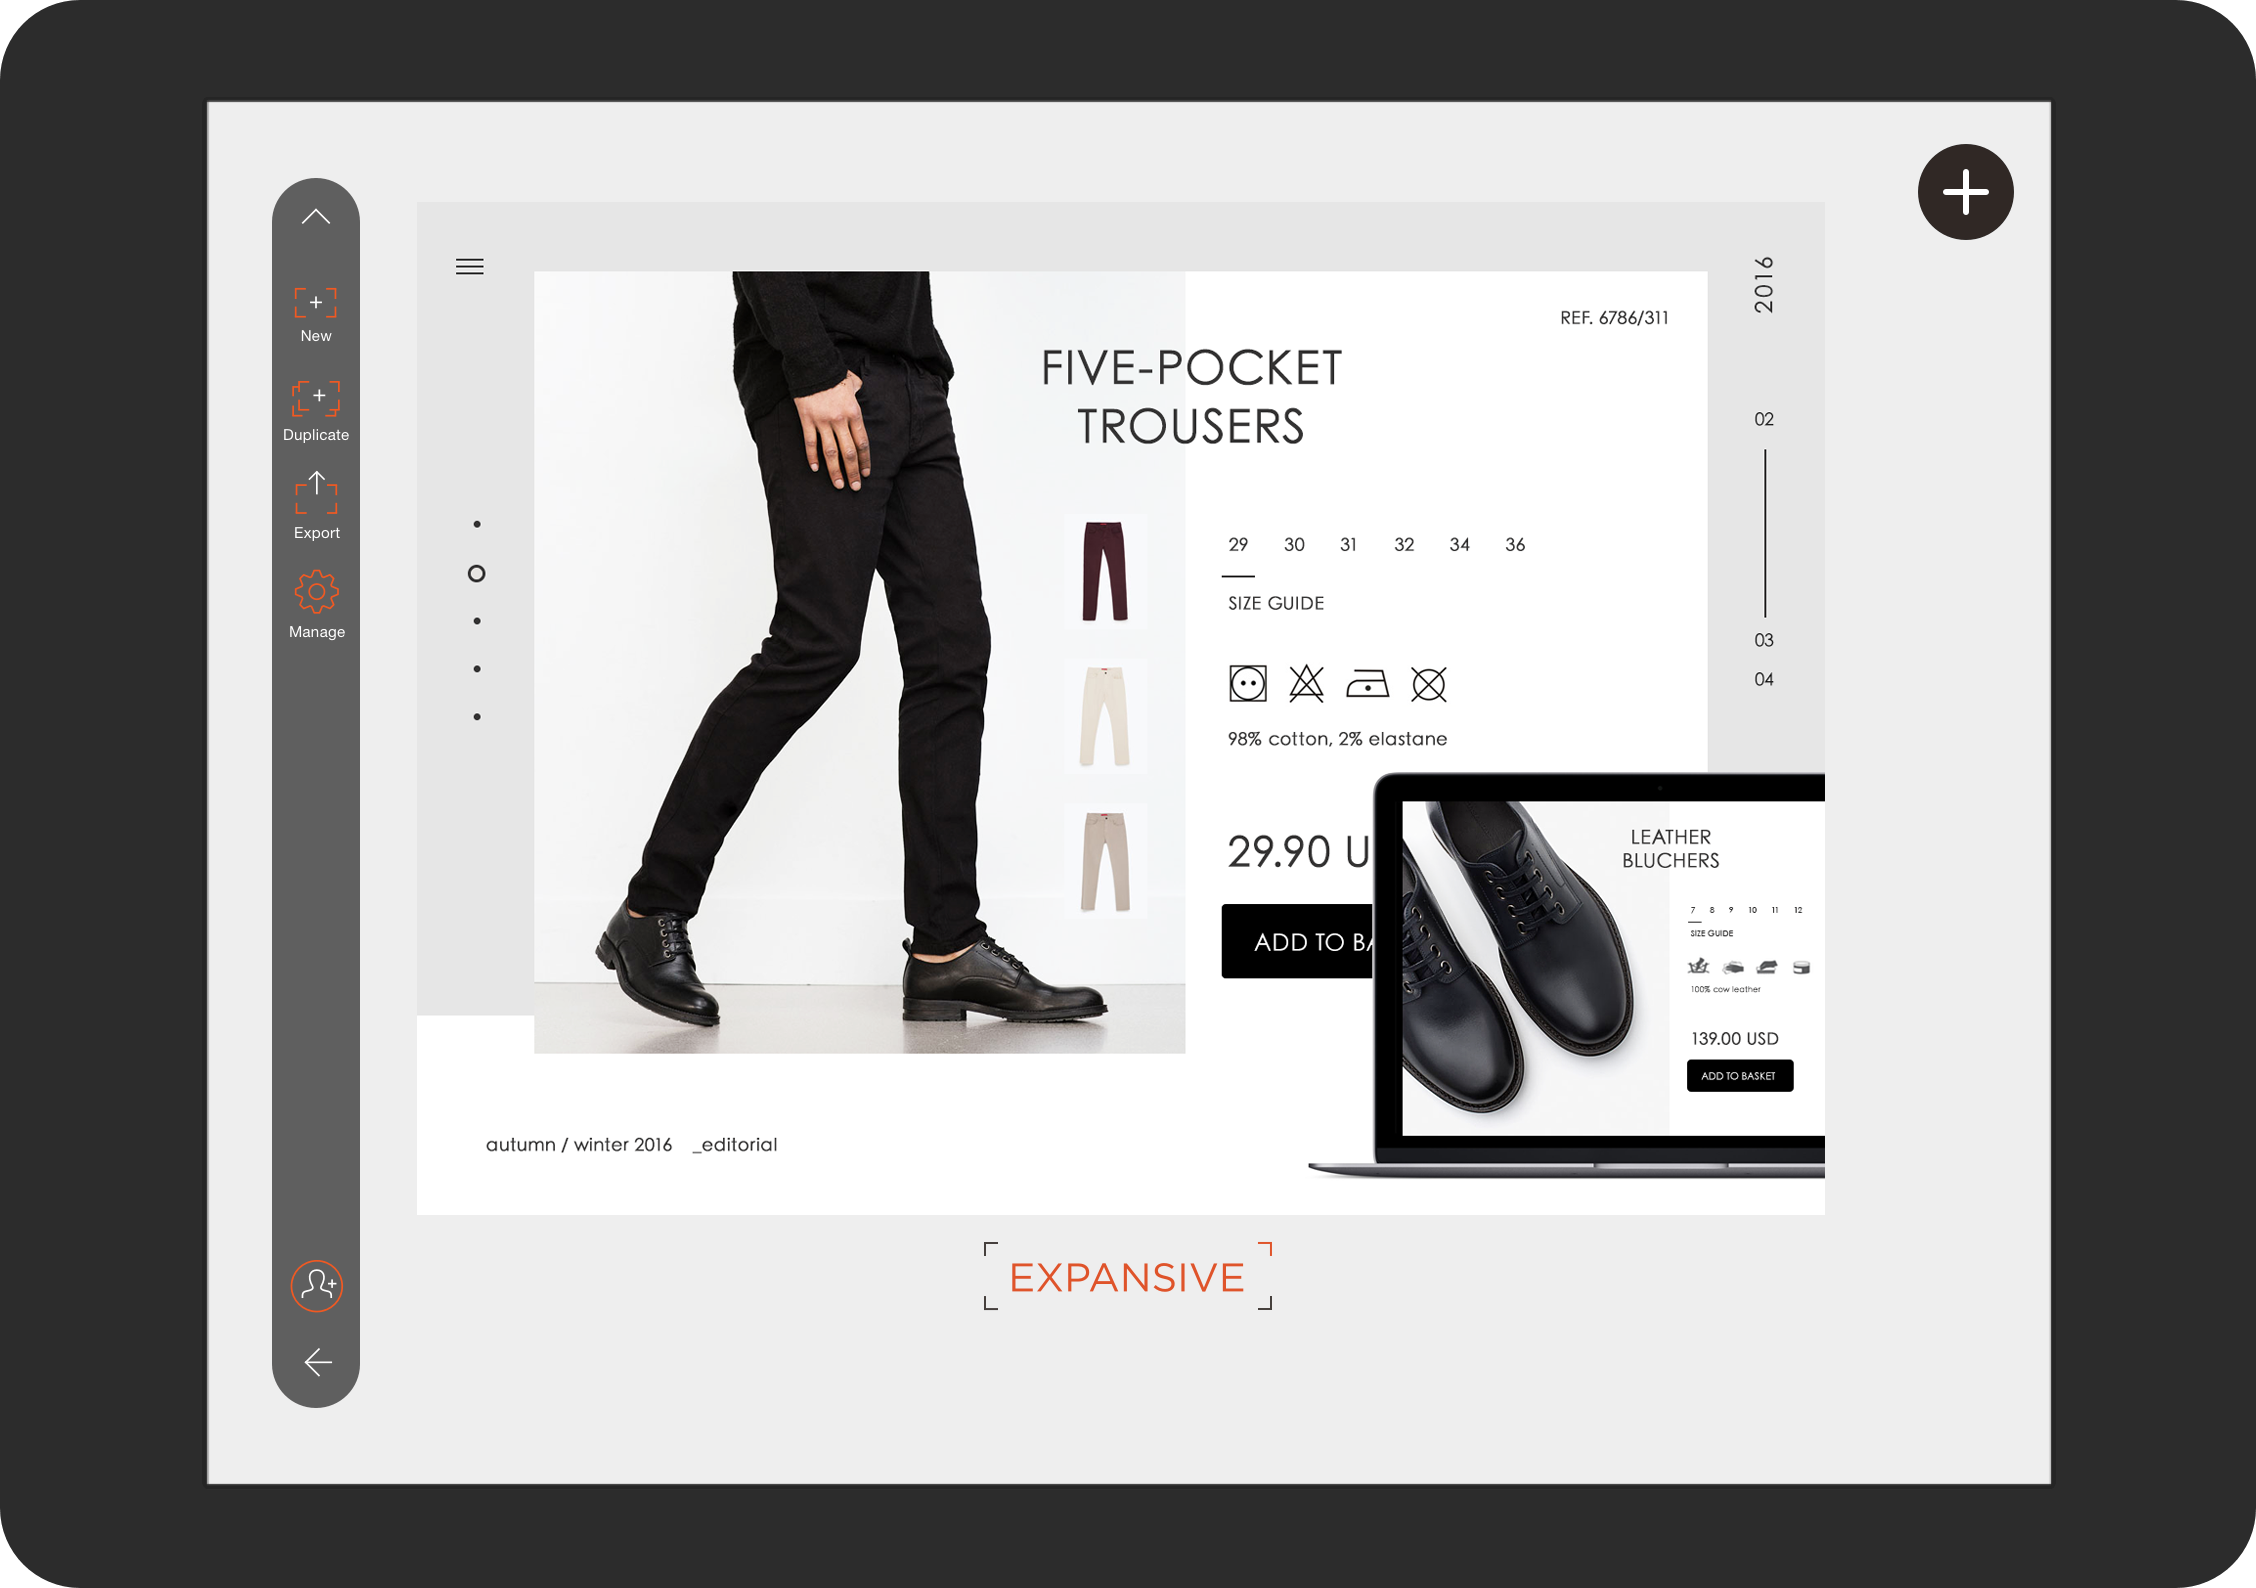 Tienda online, tiendas online, ecommerce, shop